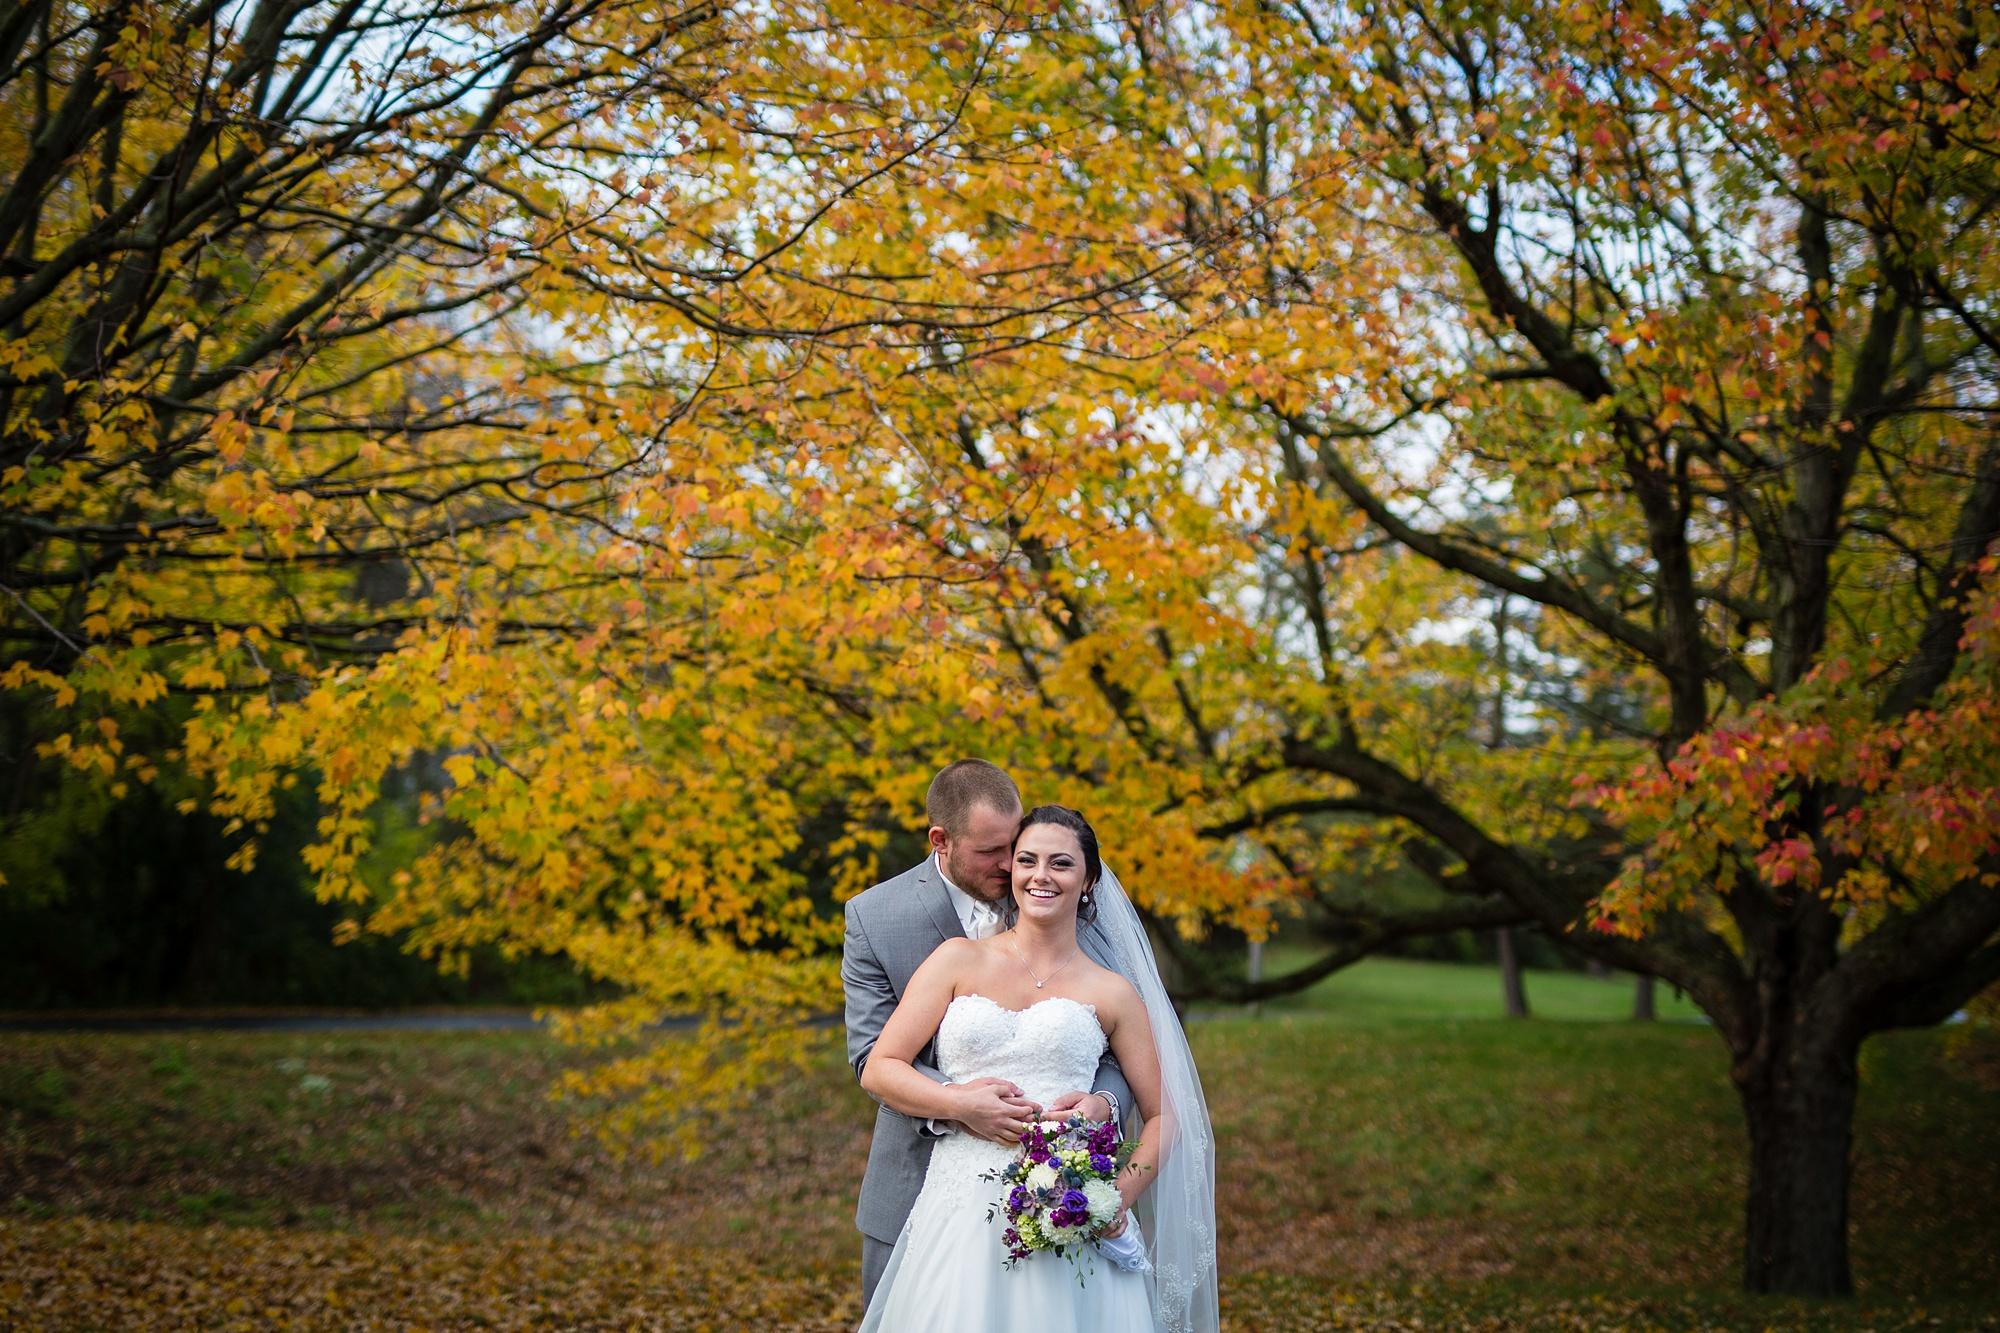 Brandon_Shafer_Photography_Emily_Travis_Kalamazoo_Wedding_Photography_0033.jpg